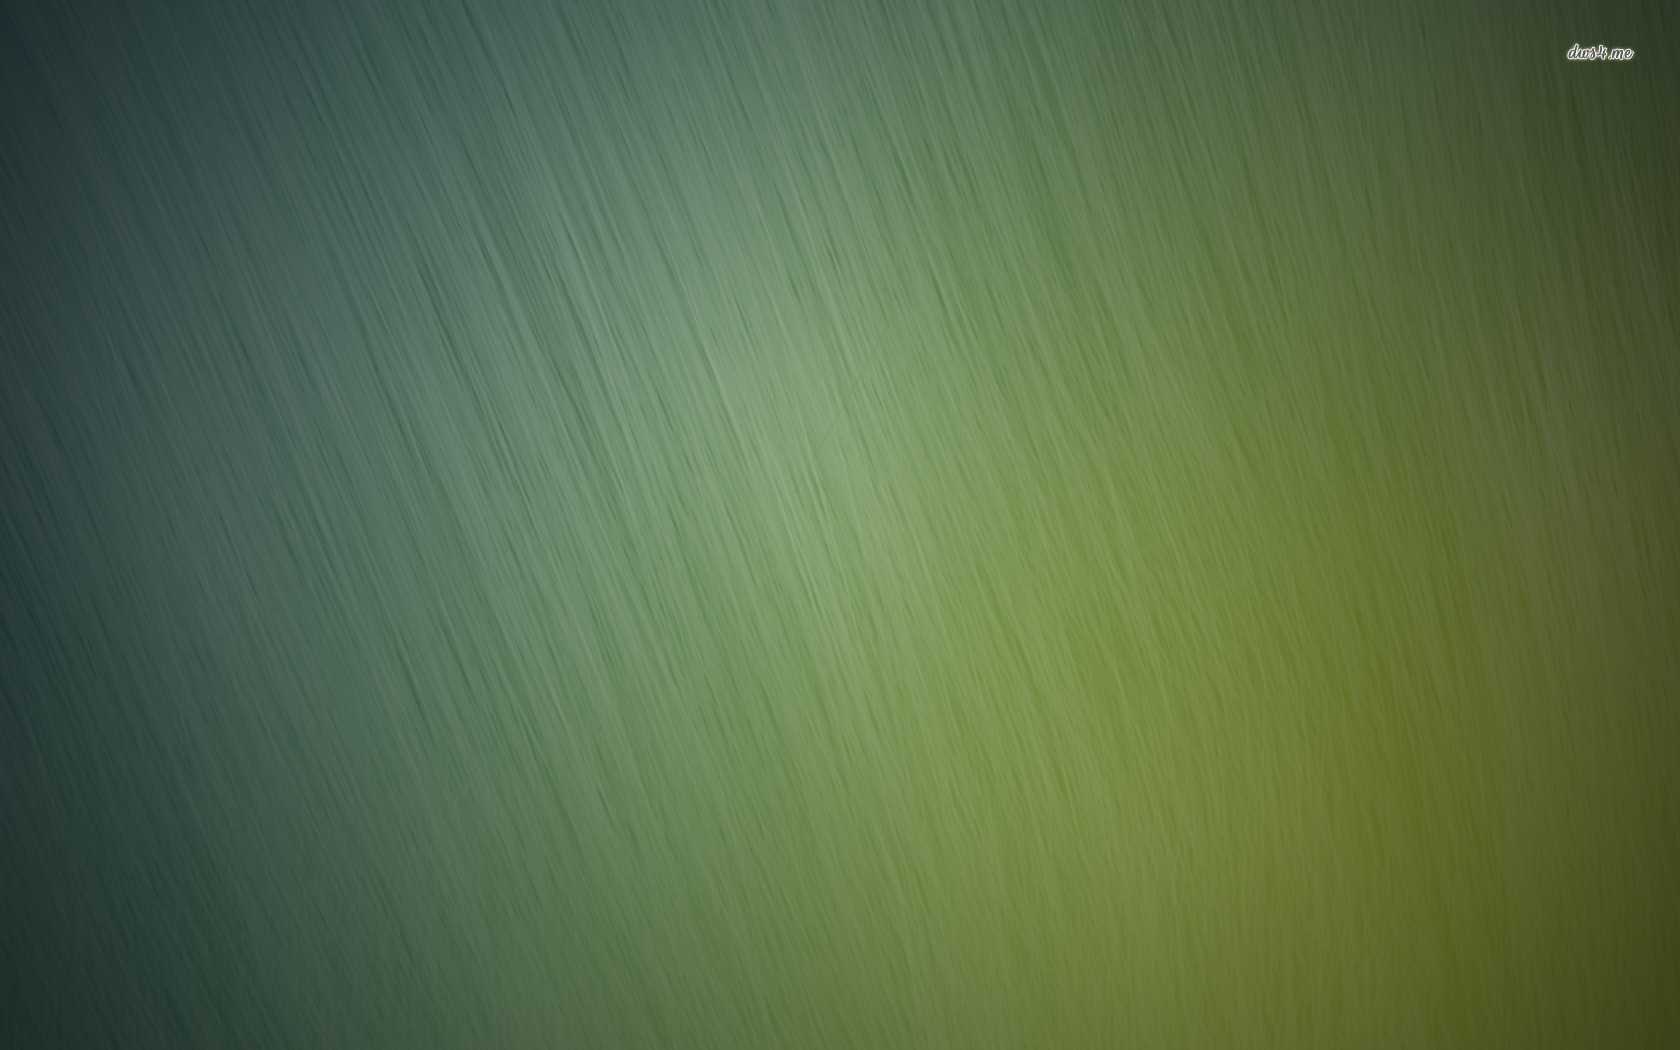 Green metallic wallpaper 1280x800 Green metallic wallpaper 1366x768 1680x1050